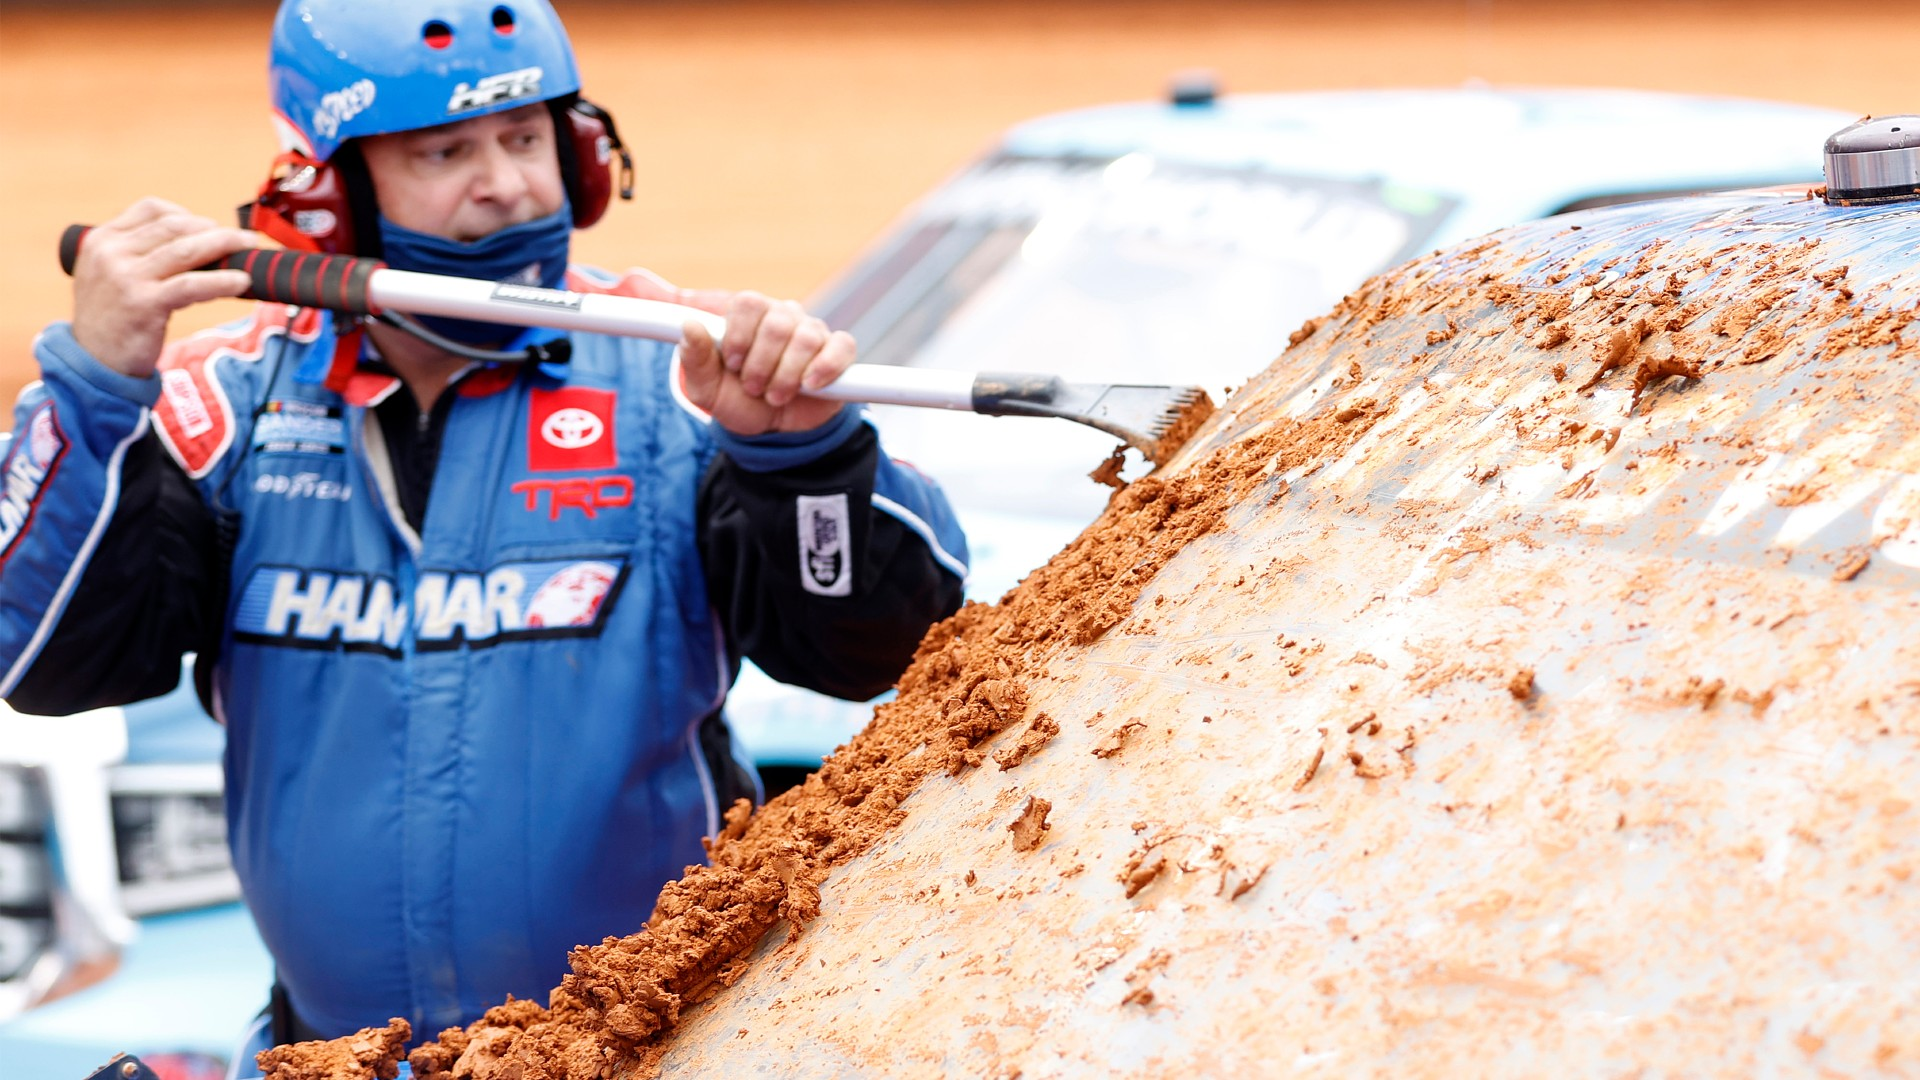 NASCAR Race Weather Updates: Forecast Rain Postpones Bristol Dirt Race to Monday